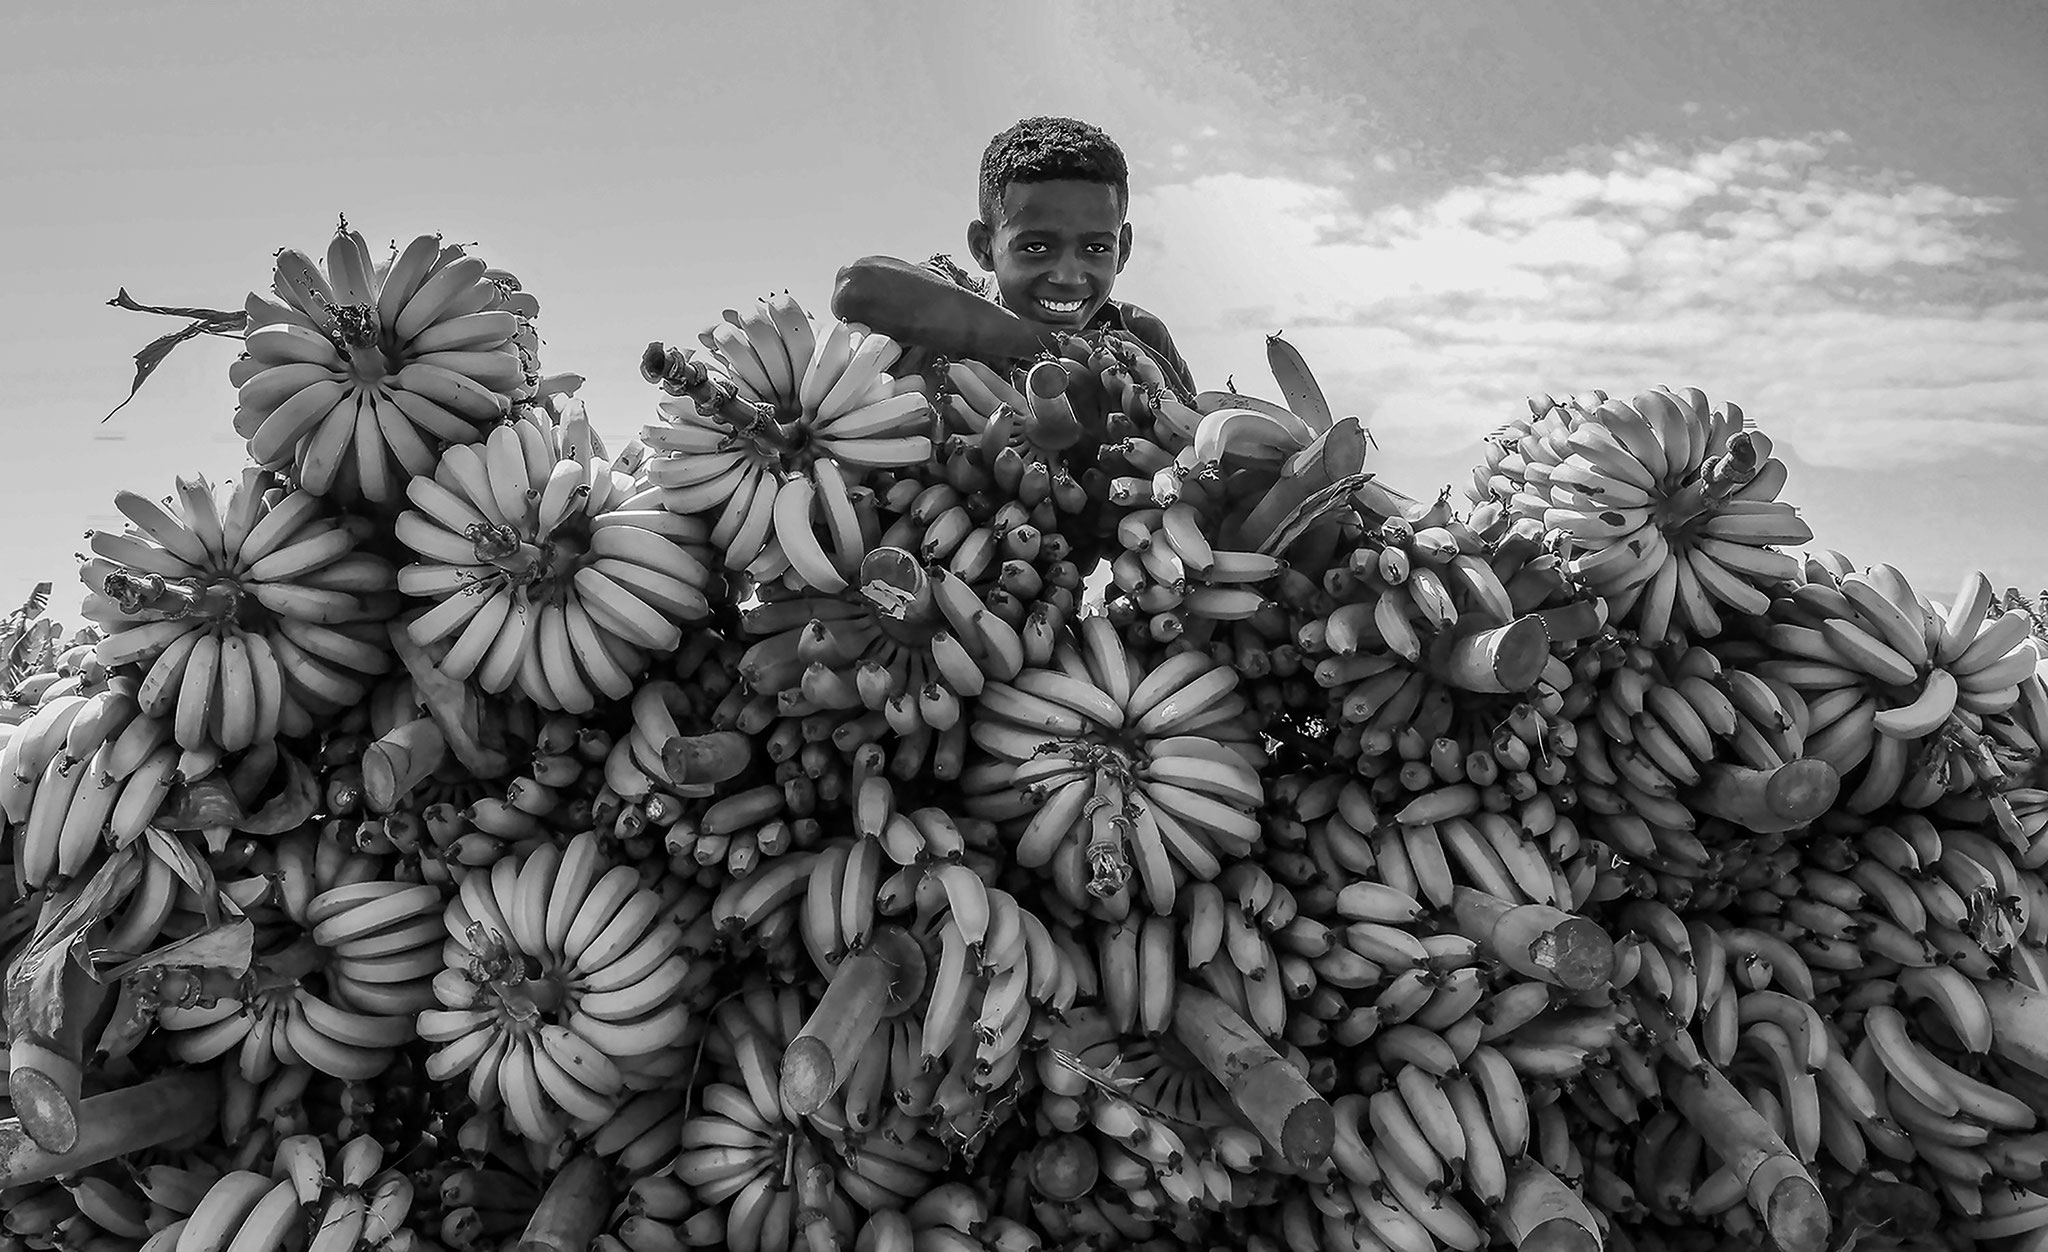 Ahmed Al-Abdulaal (Saudi Arabia) - Kid selling bananas bw